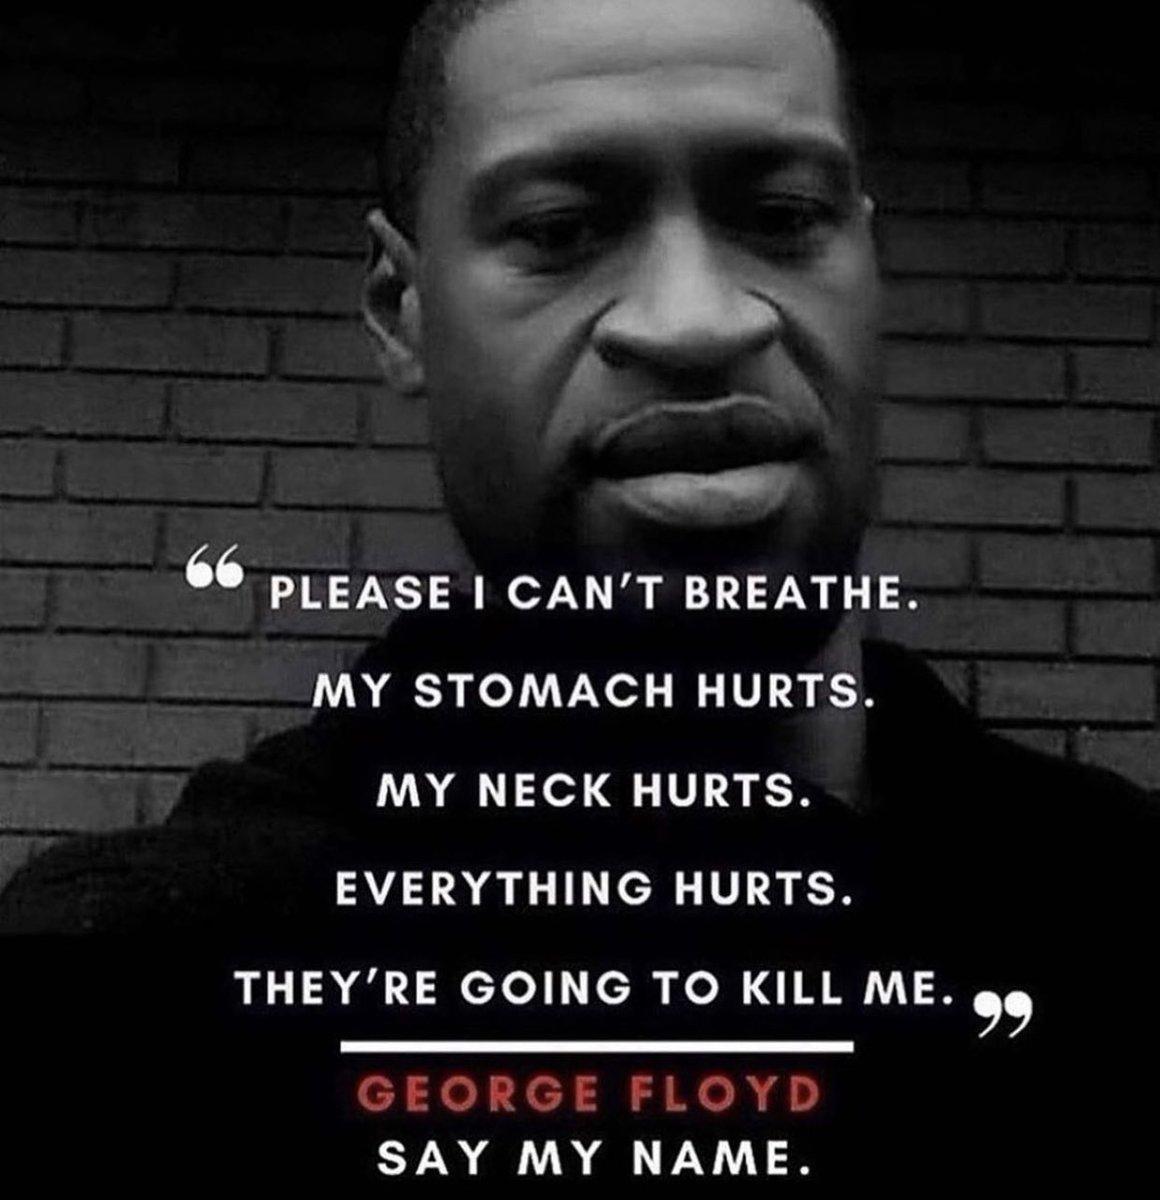 #GeorgeFloyd #georgefloydfuneral #RIPGeorgeFloyd #BlackFreedomStruggle https://t.co/9YGqEfxUQM